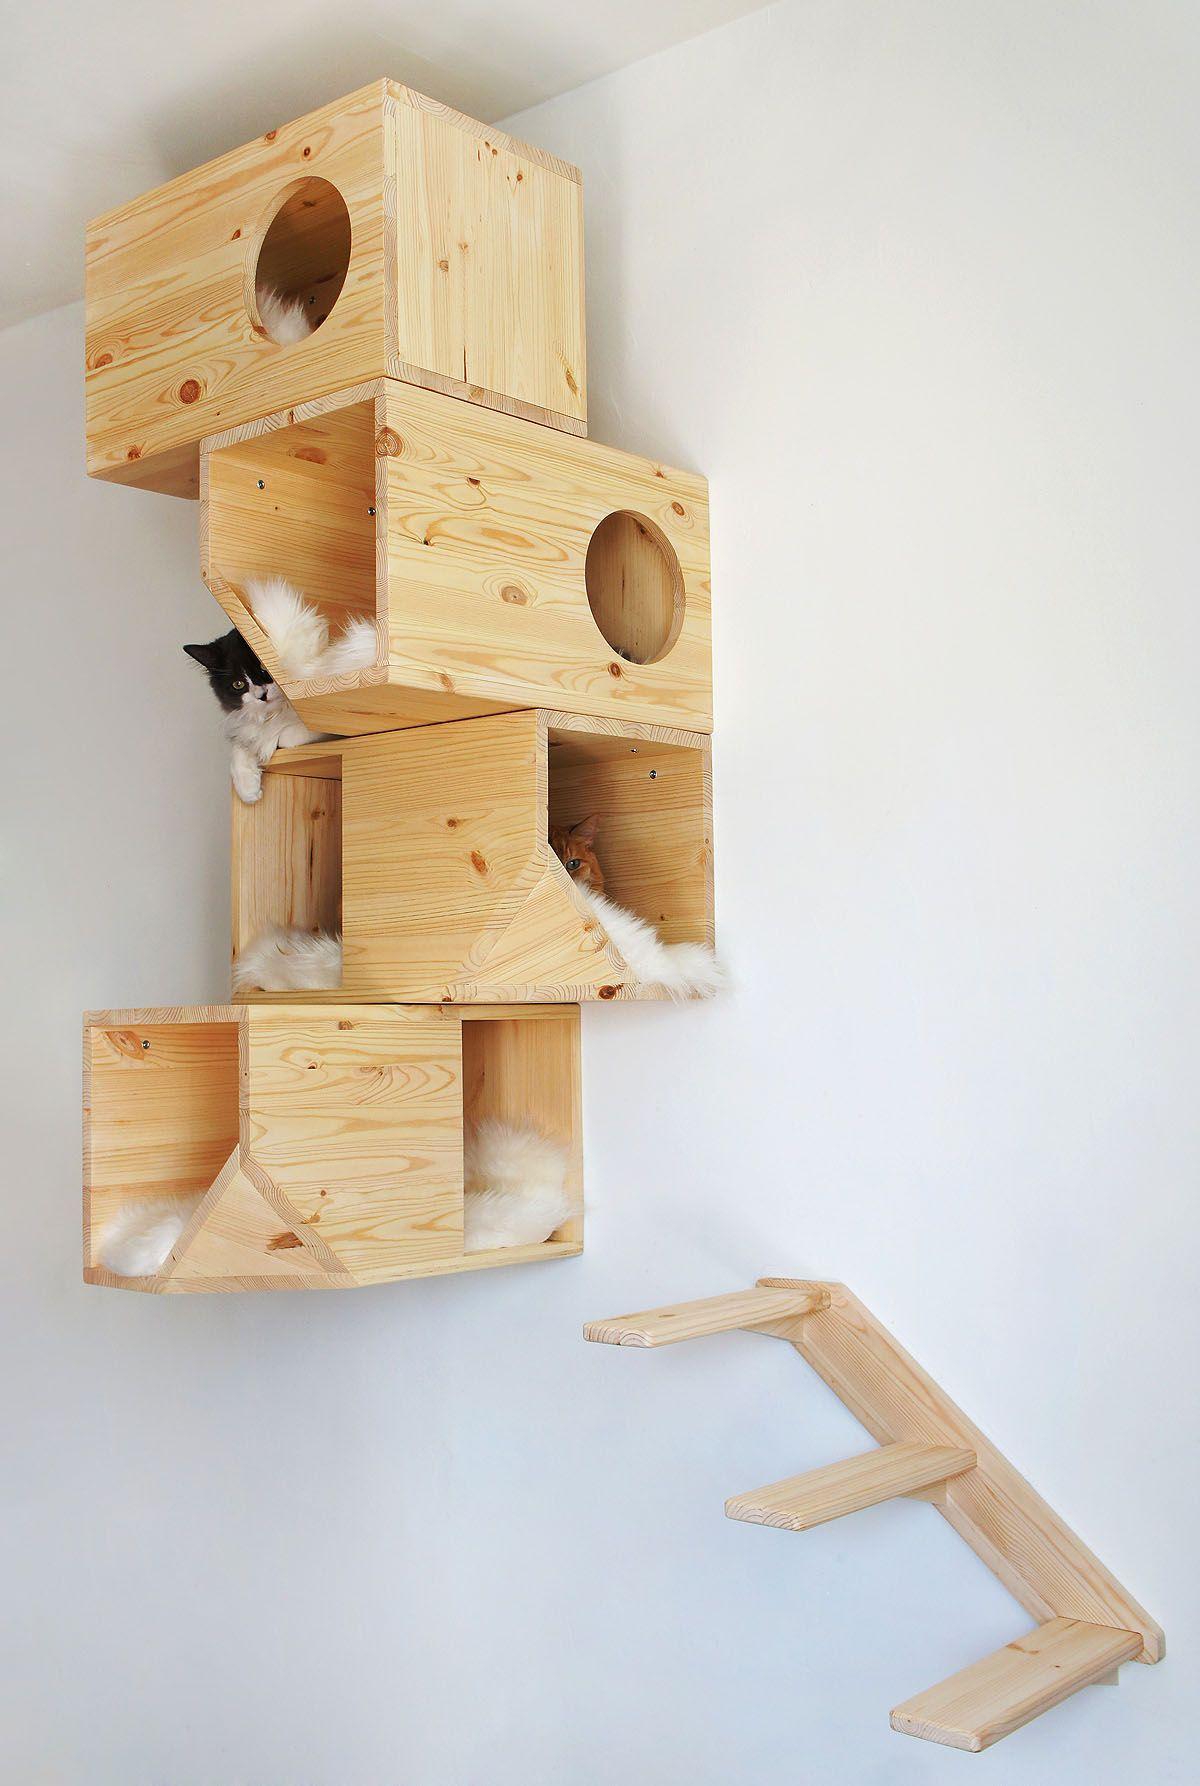 Arbre A Chat Mural Design modern arkitektur för katter | cat furniture, cat tree, decor